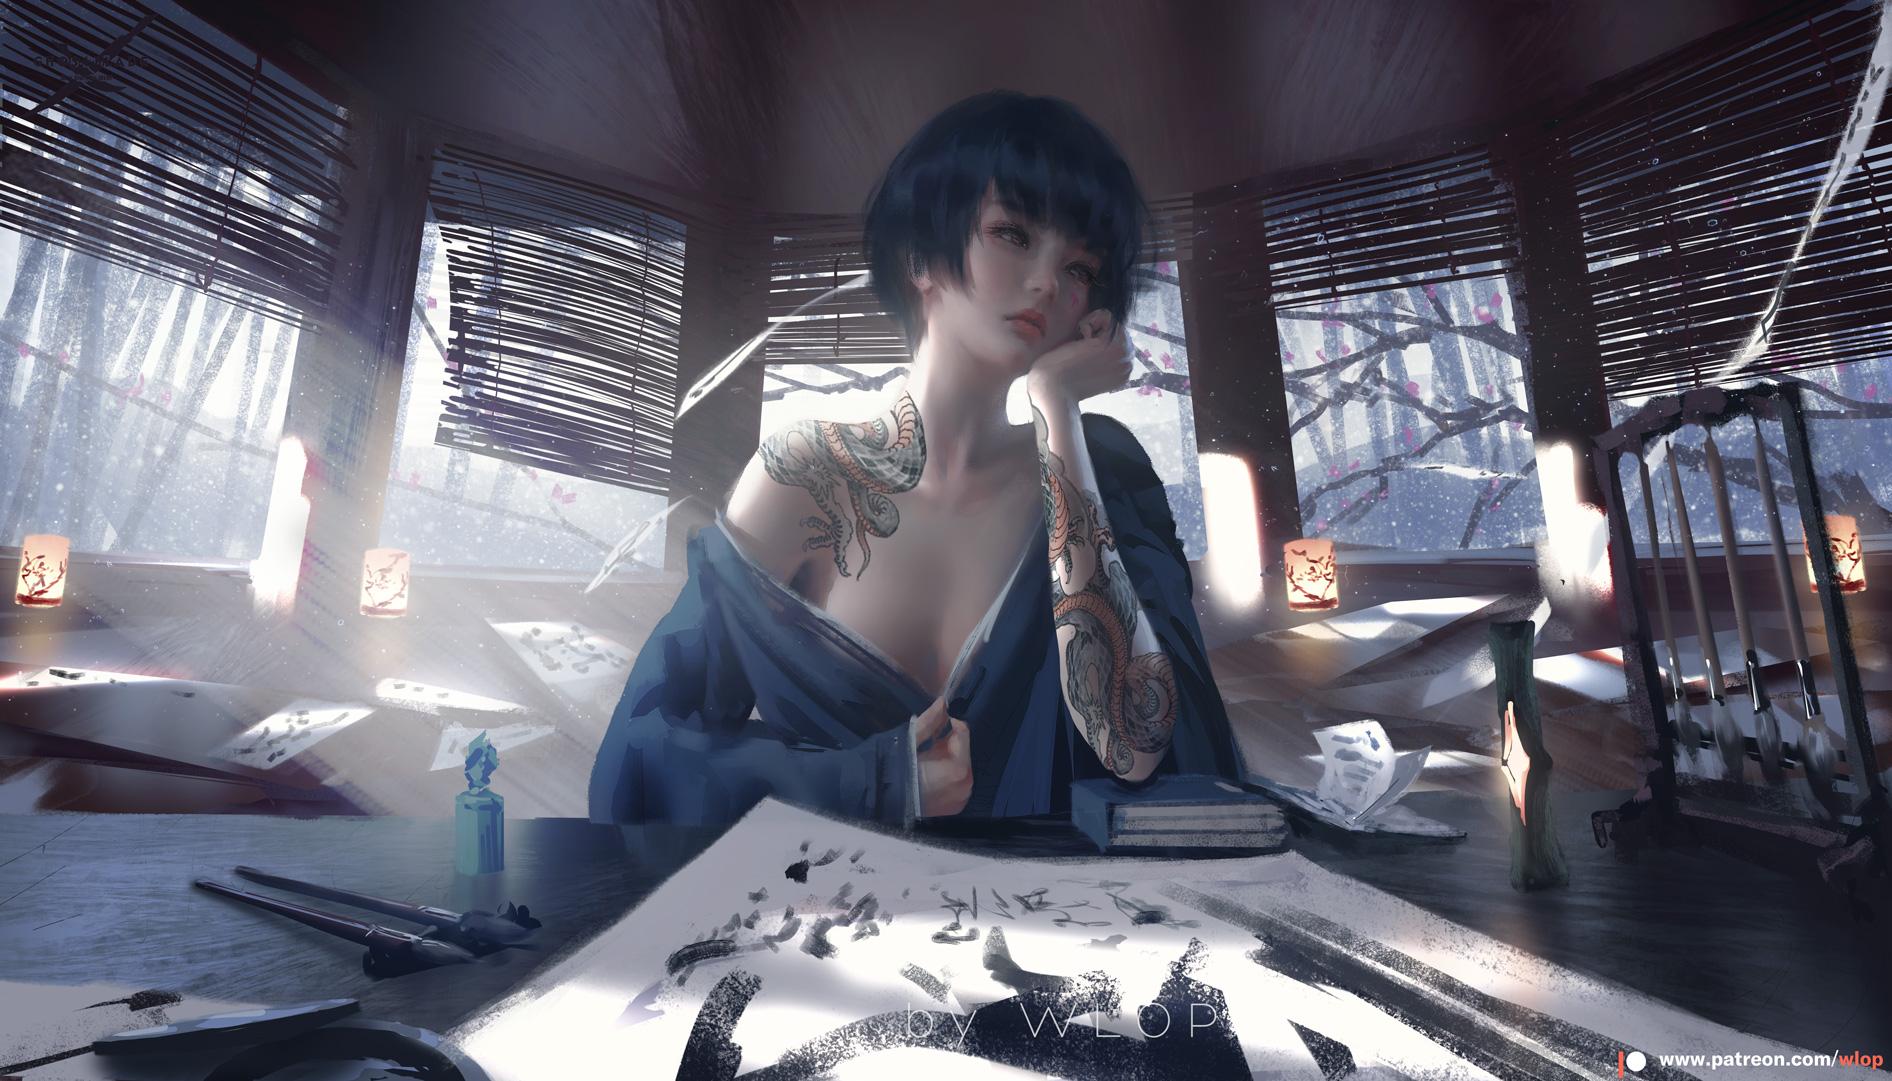 General 1892x1081 WLOP women Asian inked girls dark hair indoors sitting ArtStation looking away window no bra pulling clothing pulling dress tattoo